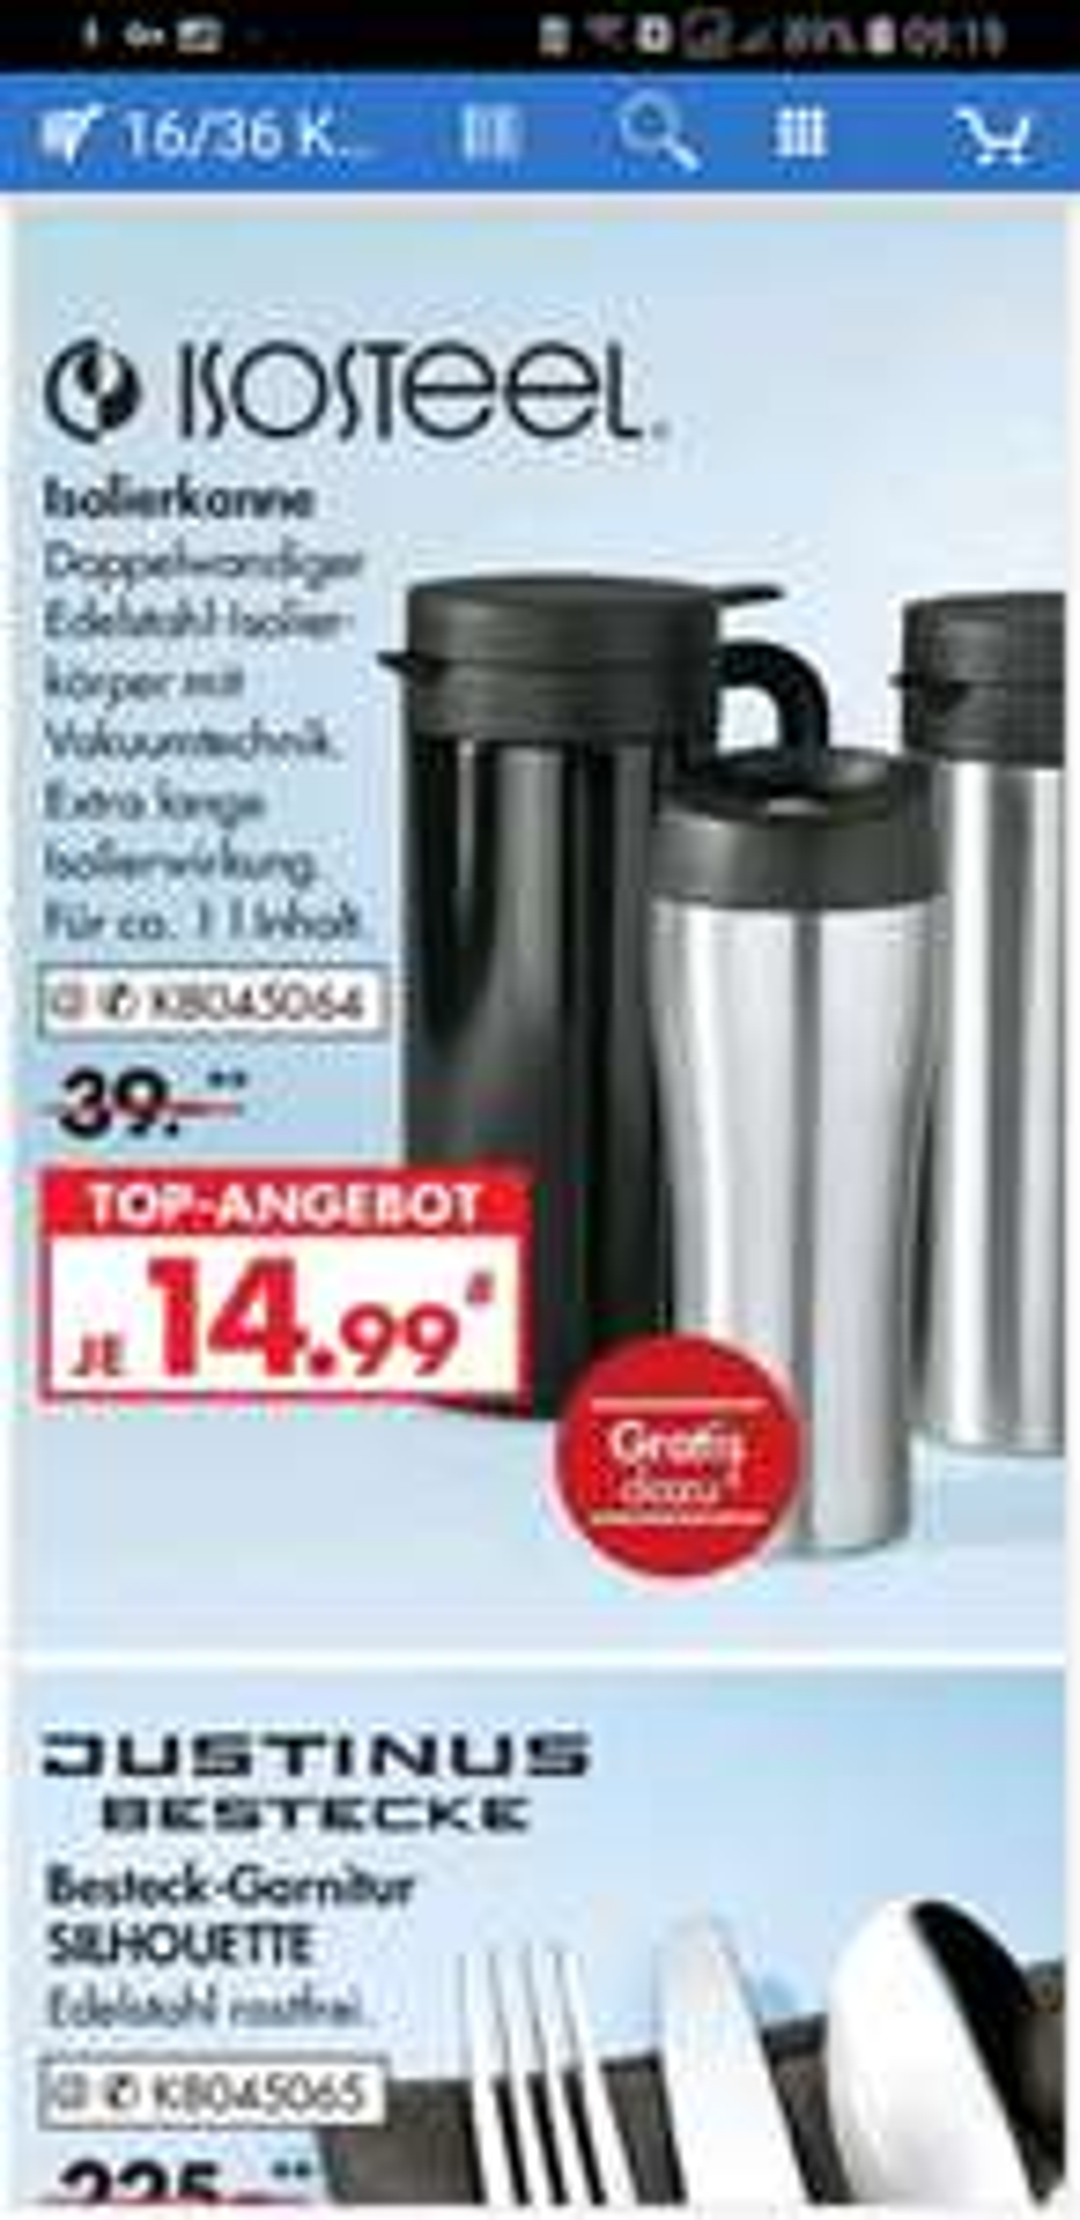 [Karstadt] Isolierkanne Isosteel+Caffe-to-go Becher 0,4liter gratis dazu